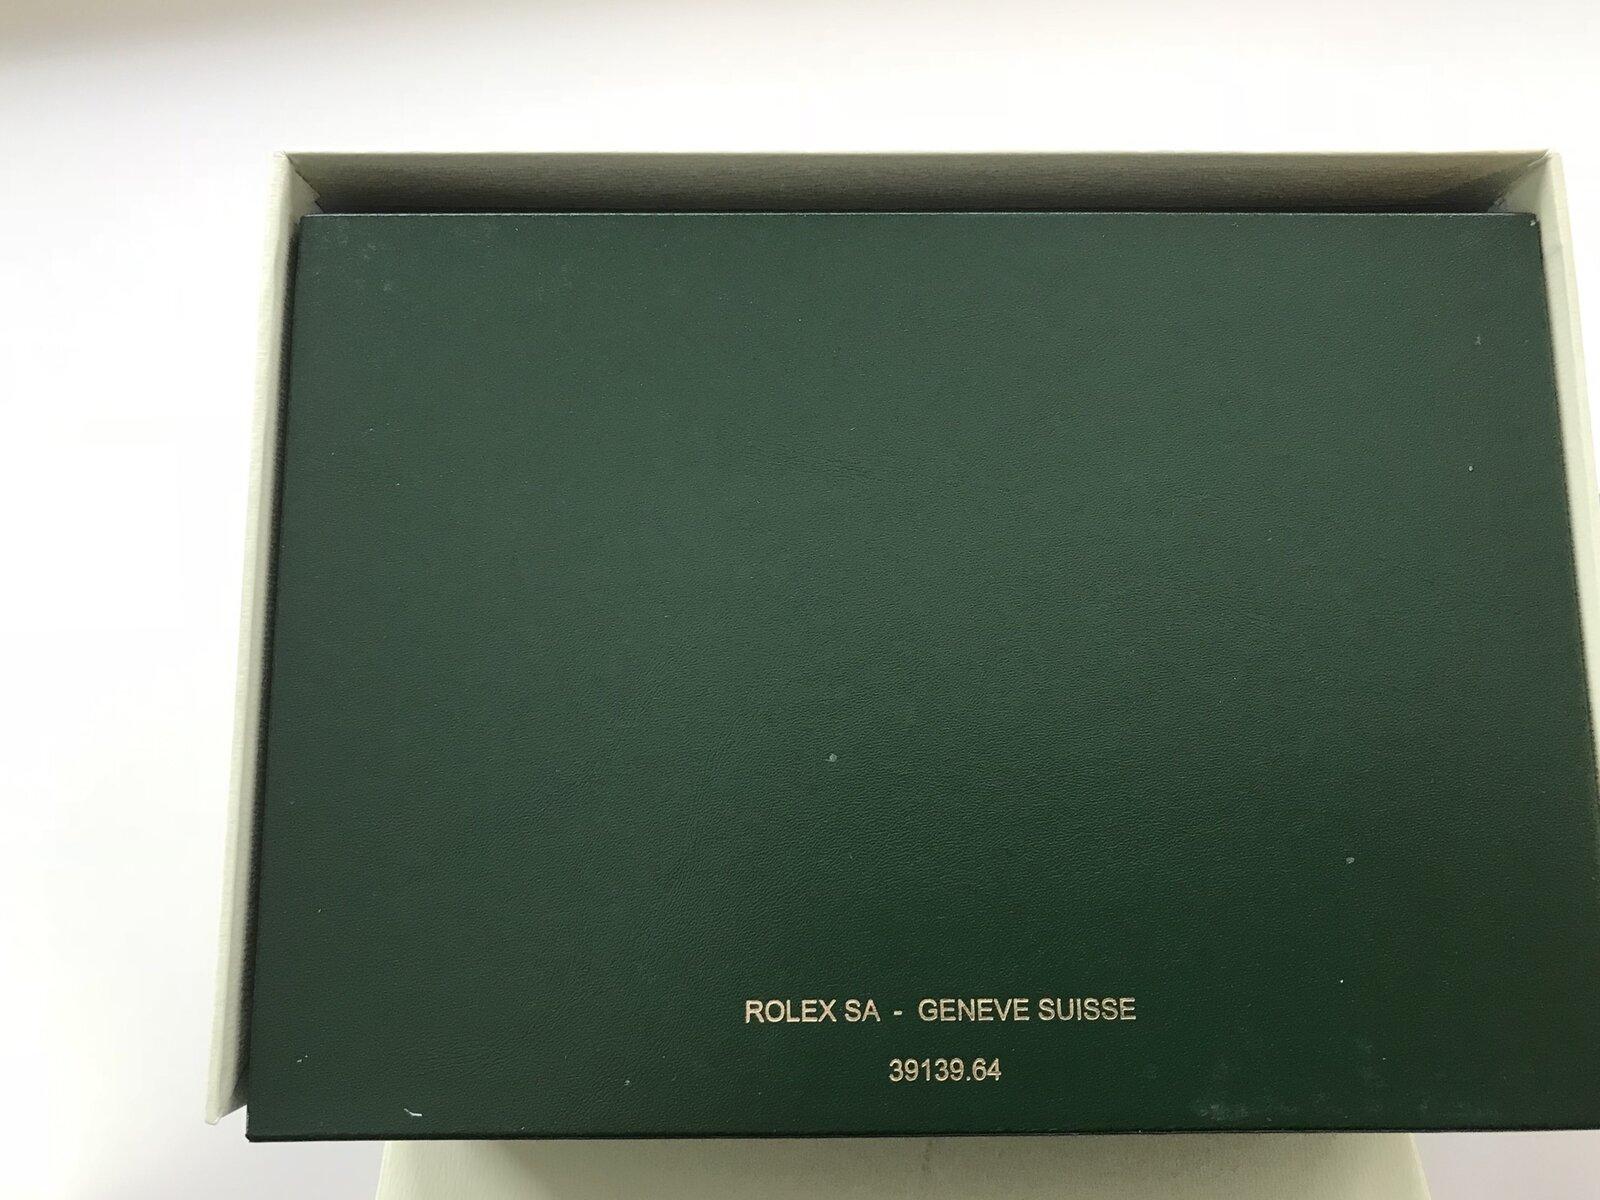 45308919-A11C-40F8-ABEA-9C4BF6A0019A.